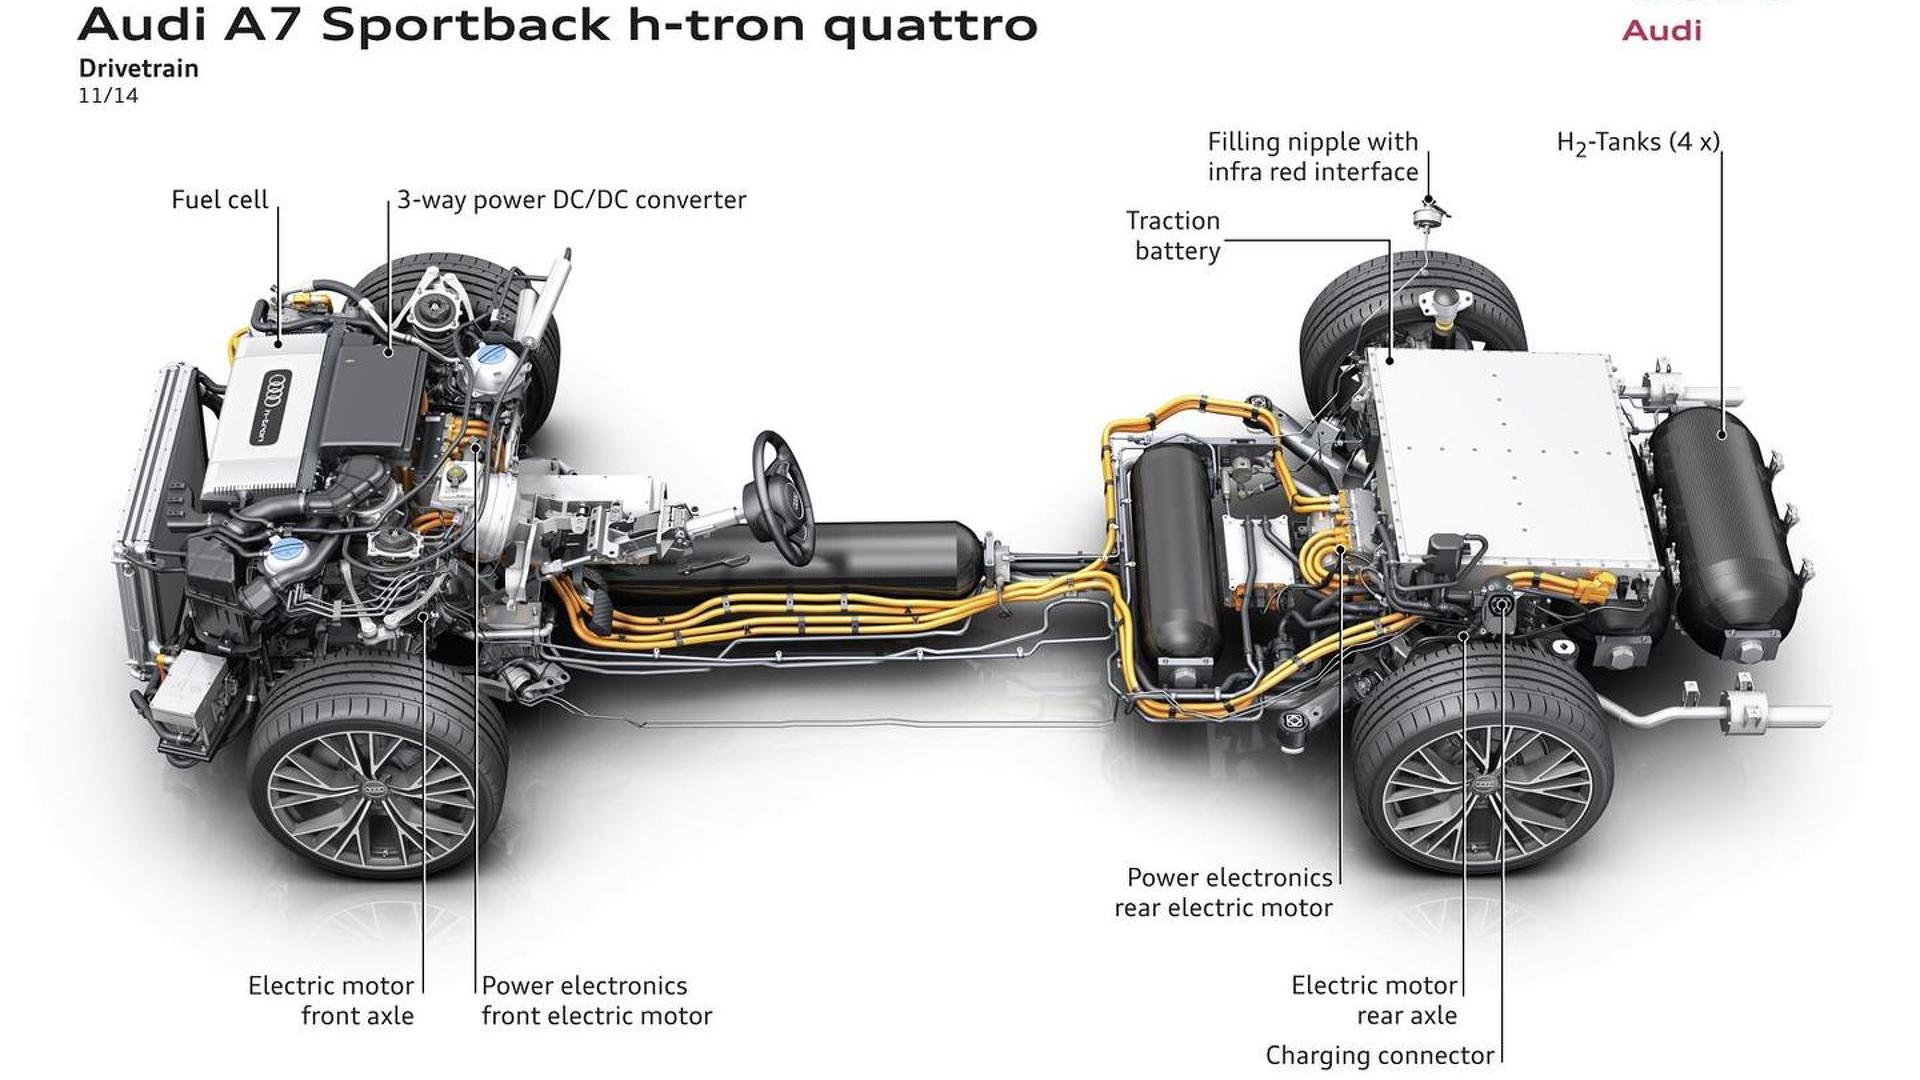 Шасси Audi A7 Sportback h-tron quattro